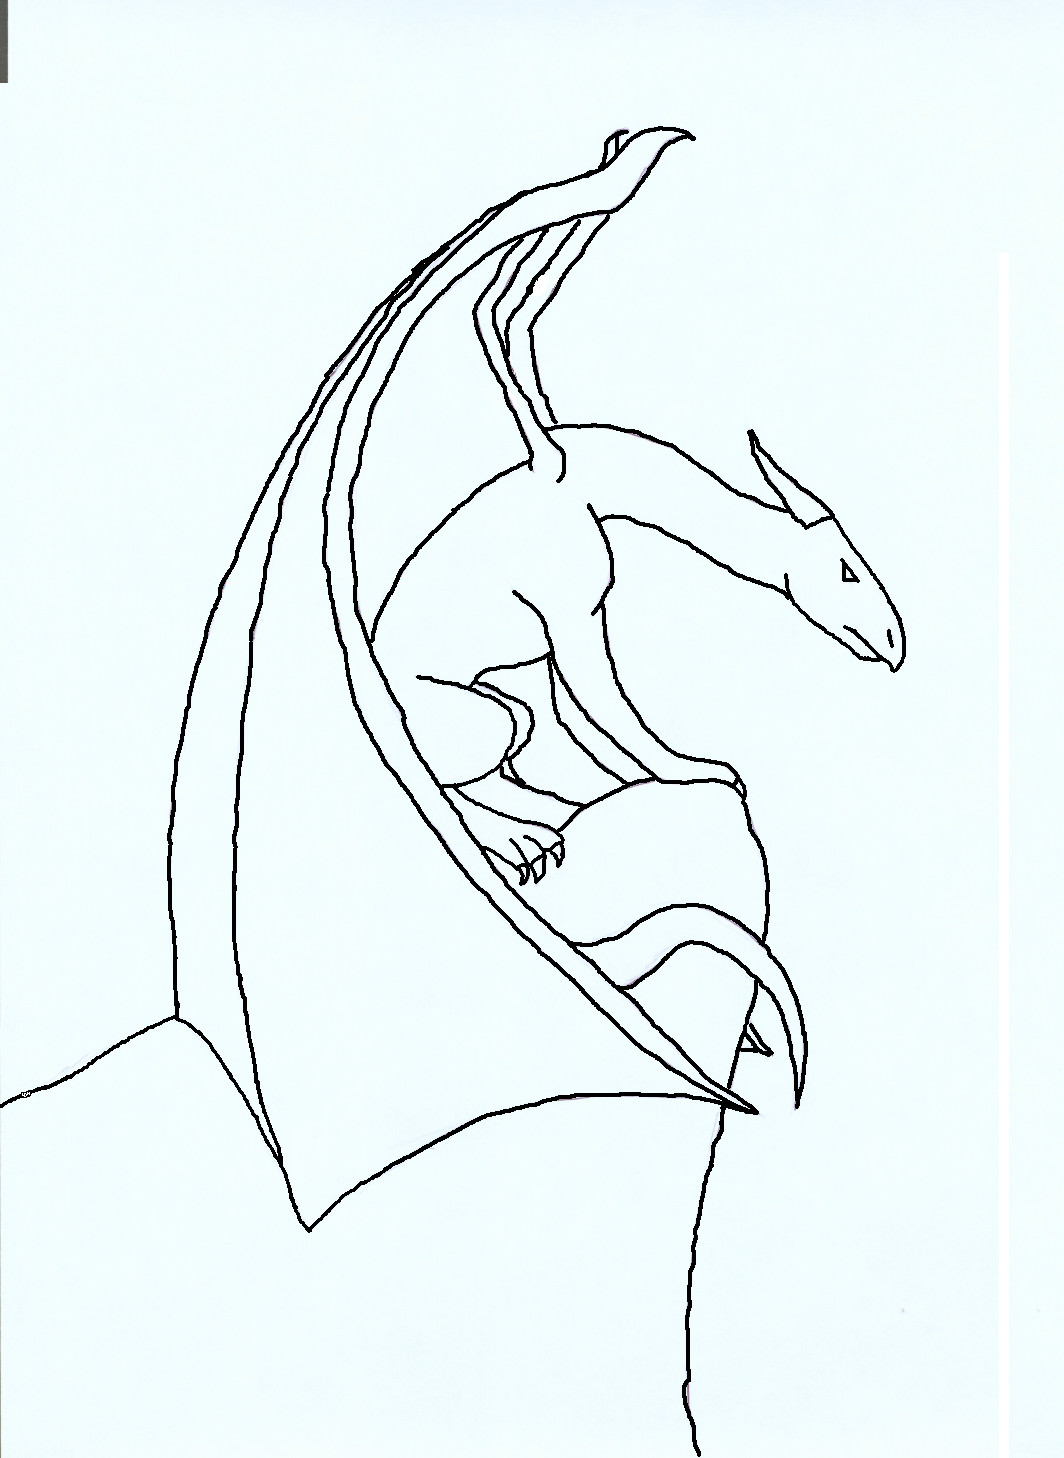 Line Drawing Dragon : Perching dragon line art by arzosah on deviantart